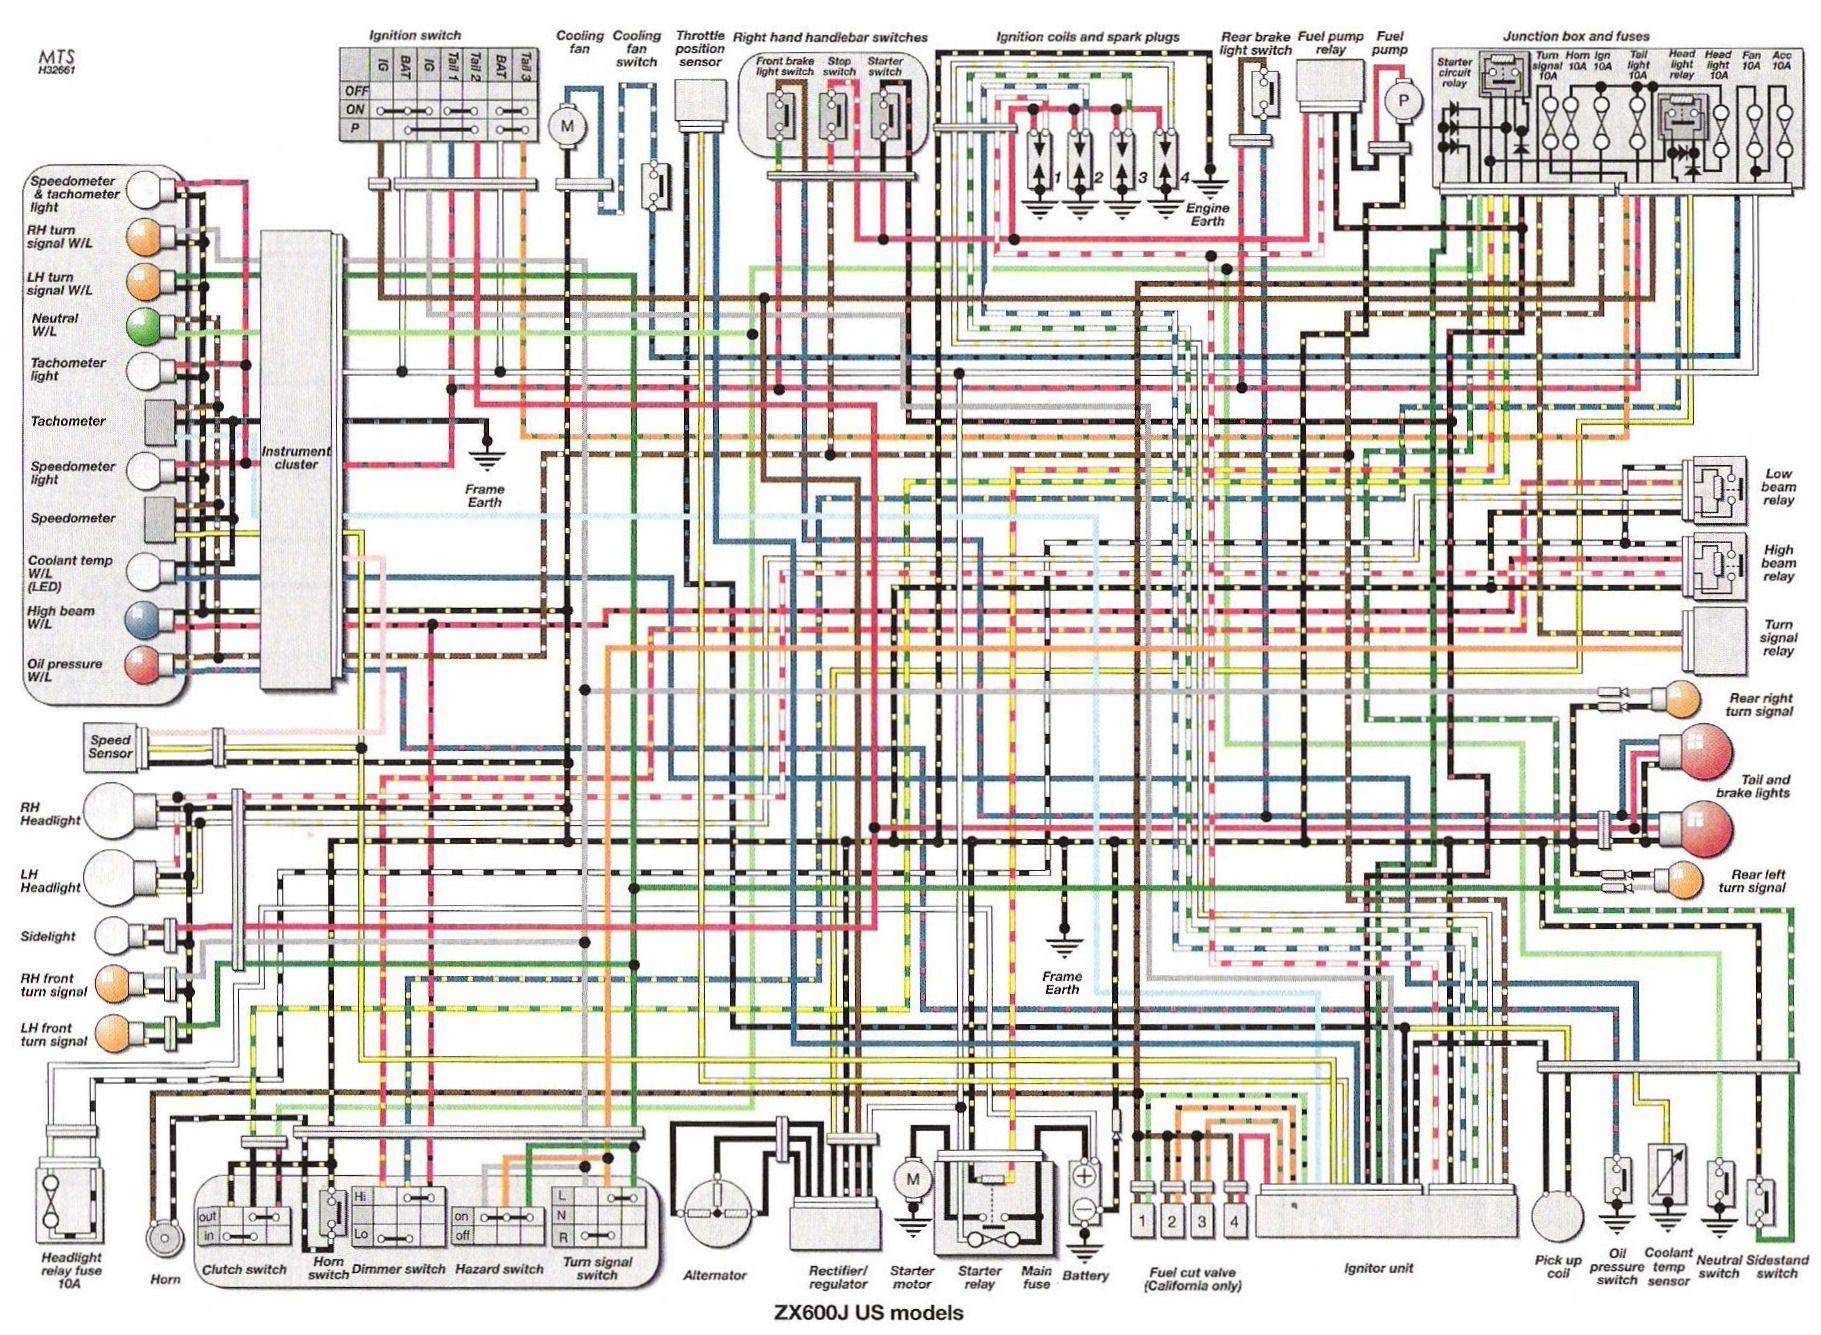 2003 Yamaha R6 Wiring Diagram Gooddy Org And Yamaha R6 Sistema Electrico Electrica